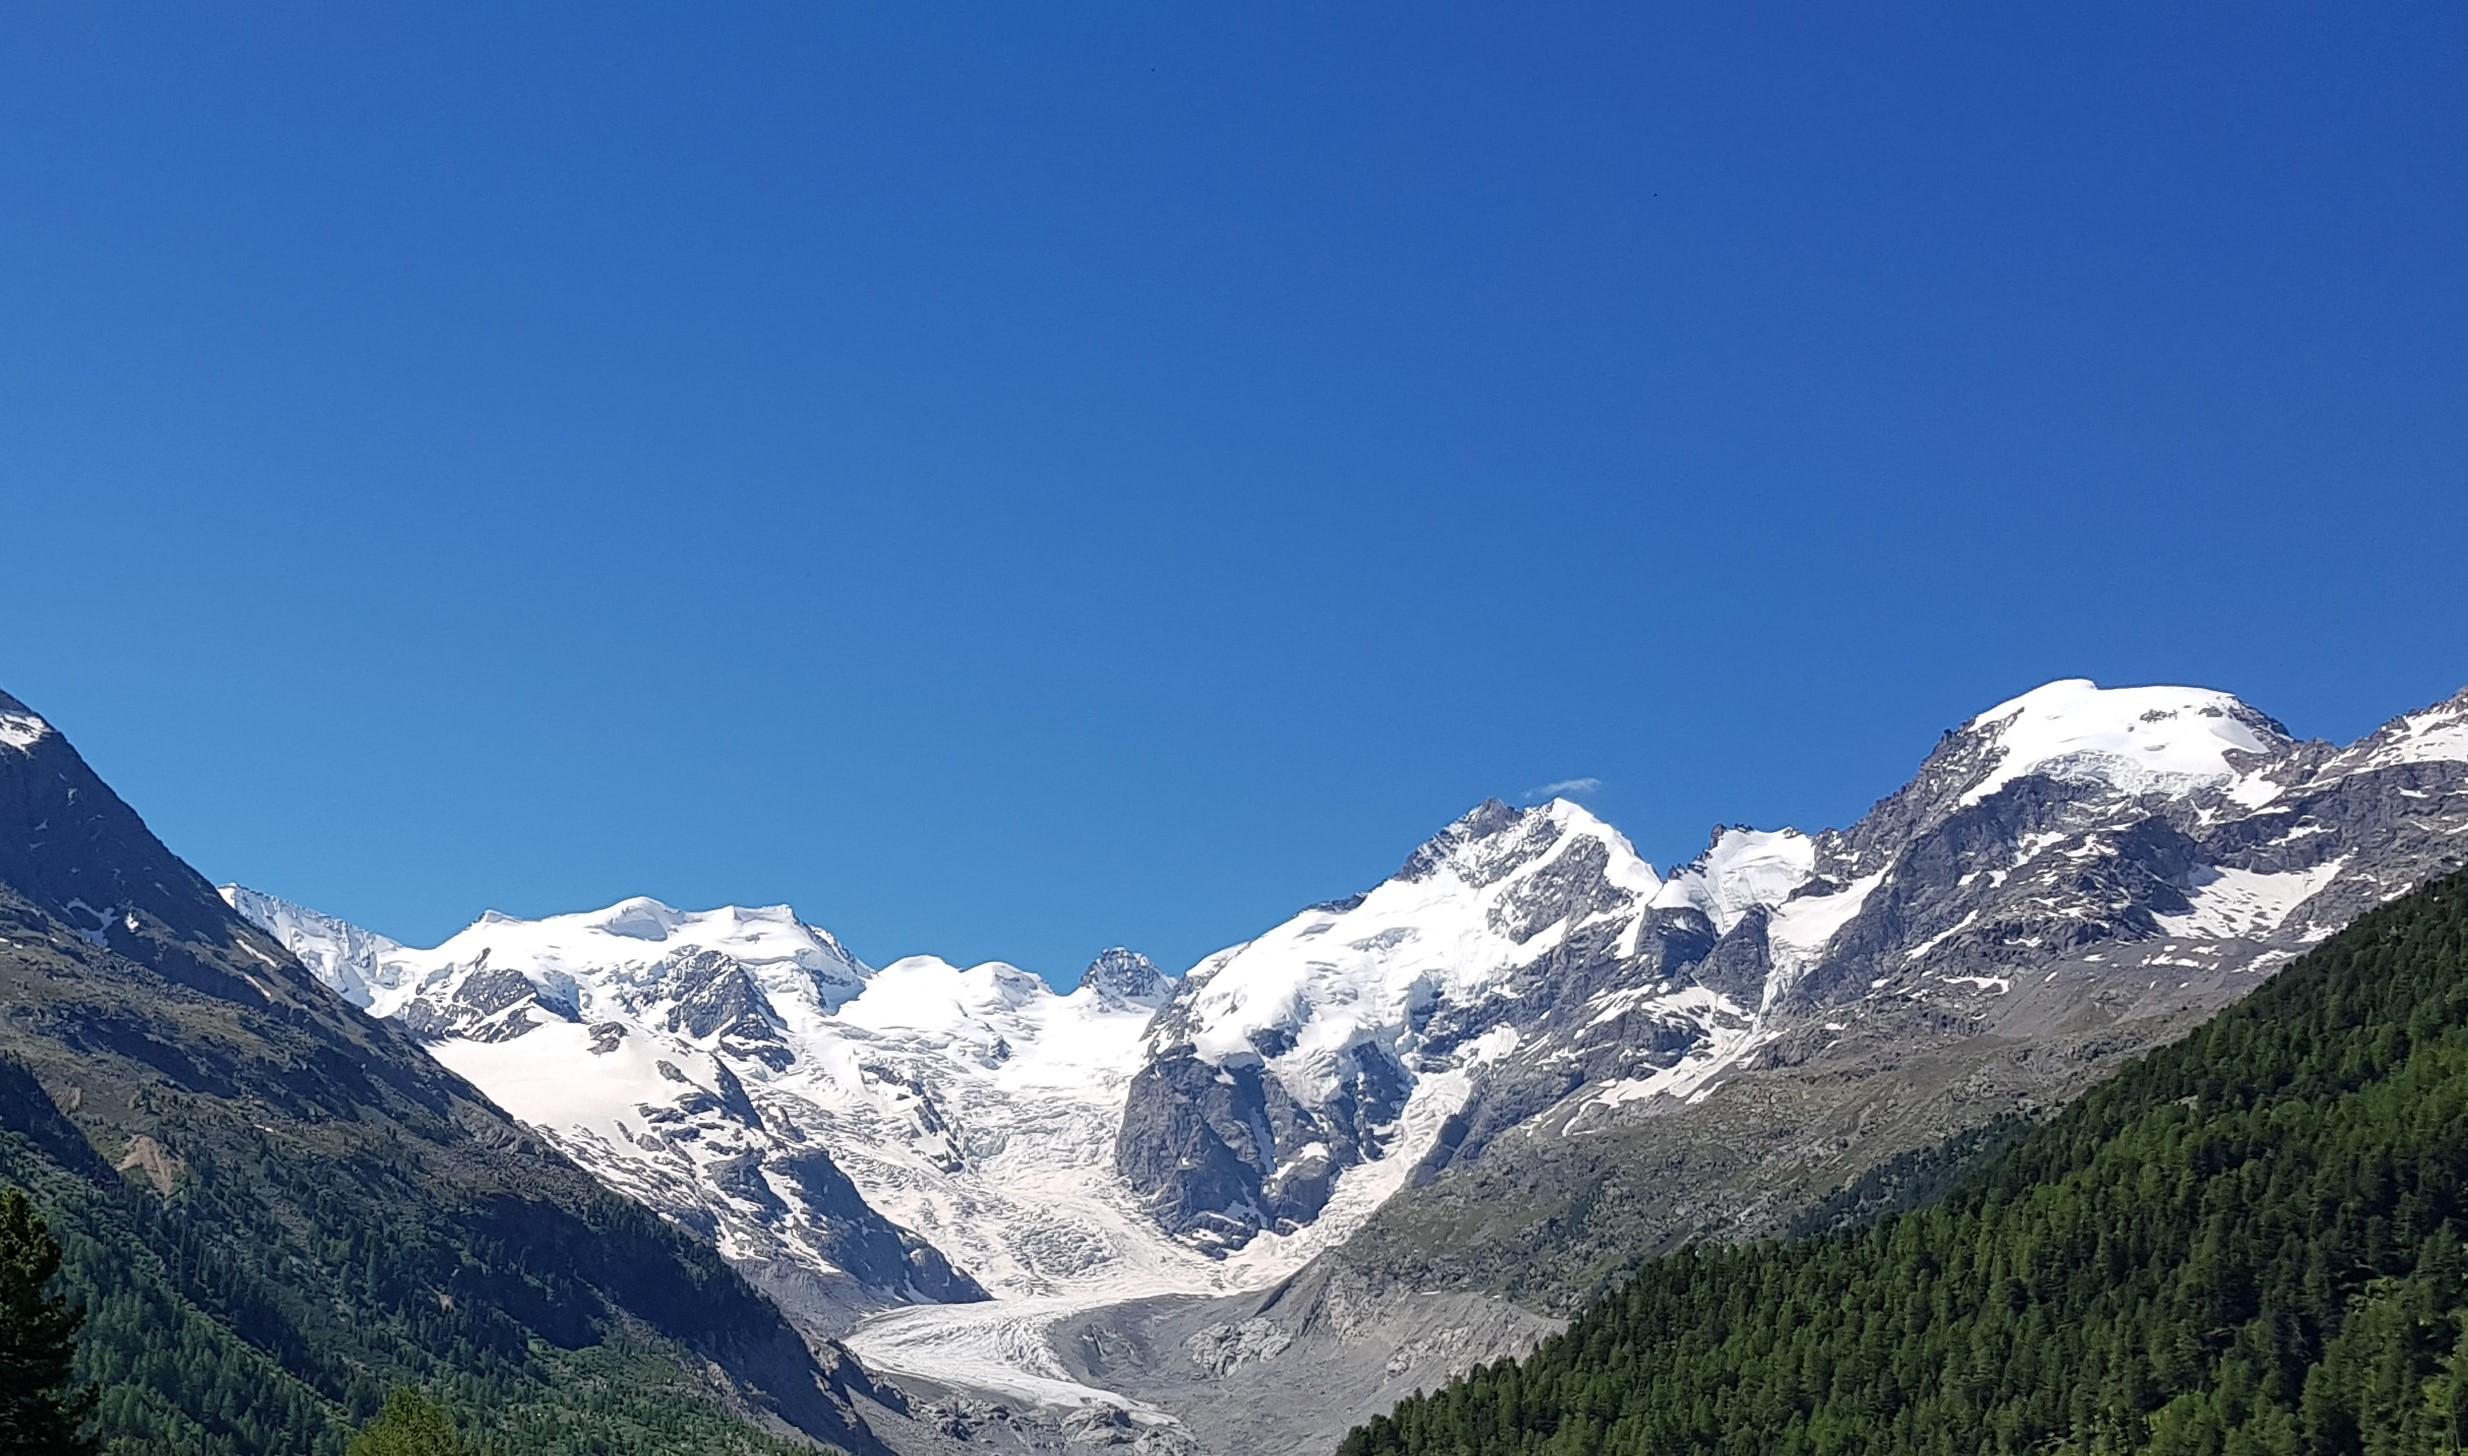 Engadine, Pontresina, Morteratsch, view on Glacier, Val Morteratsch, Piz Boval